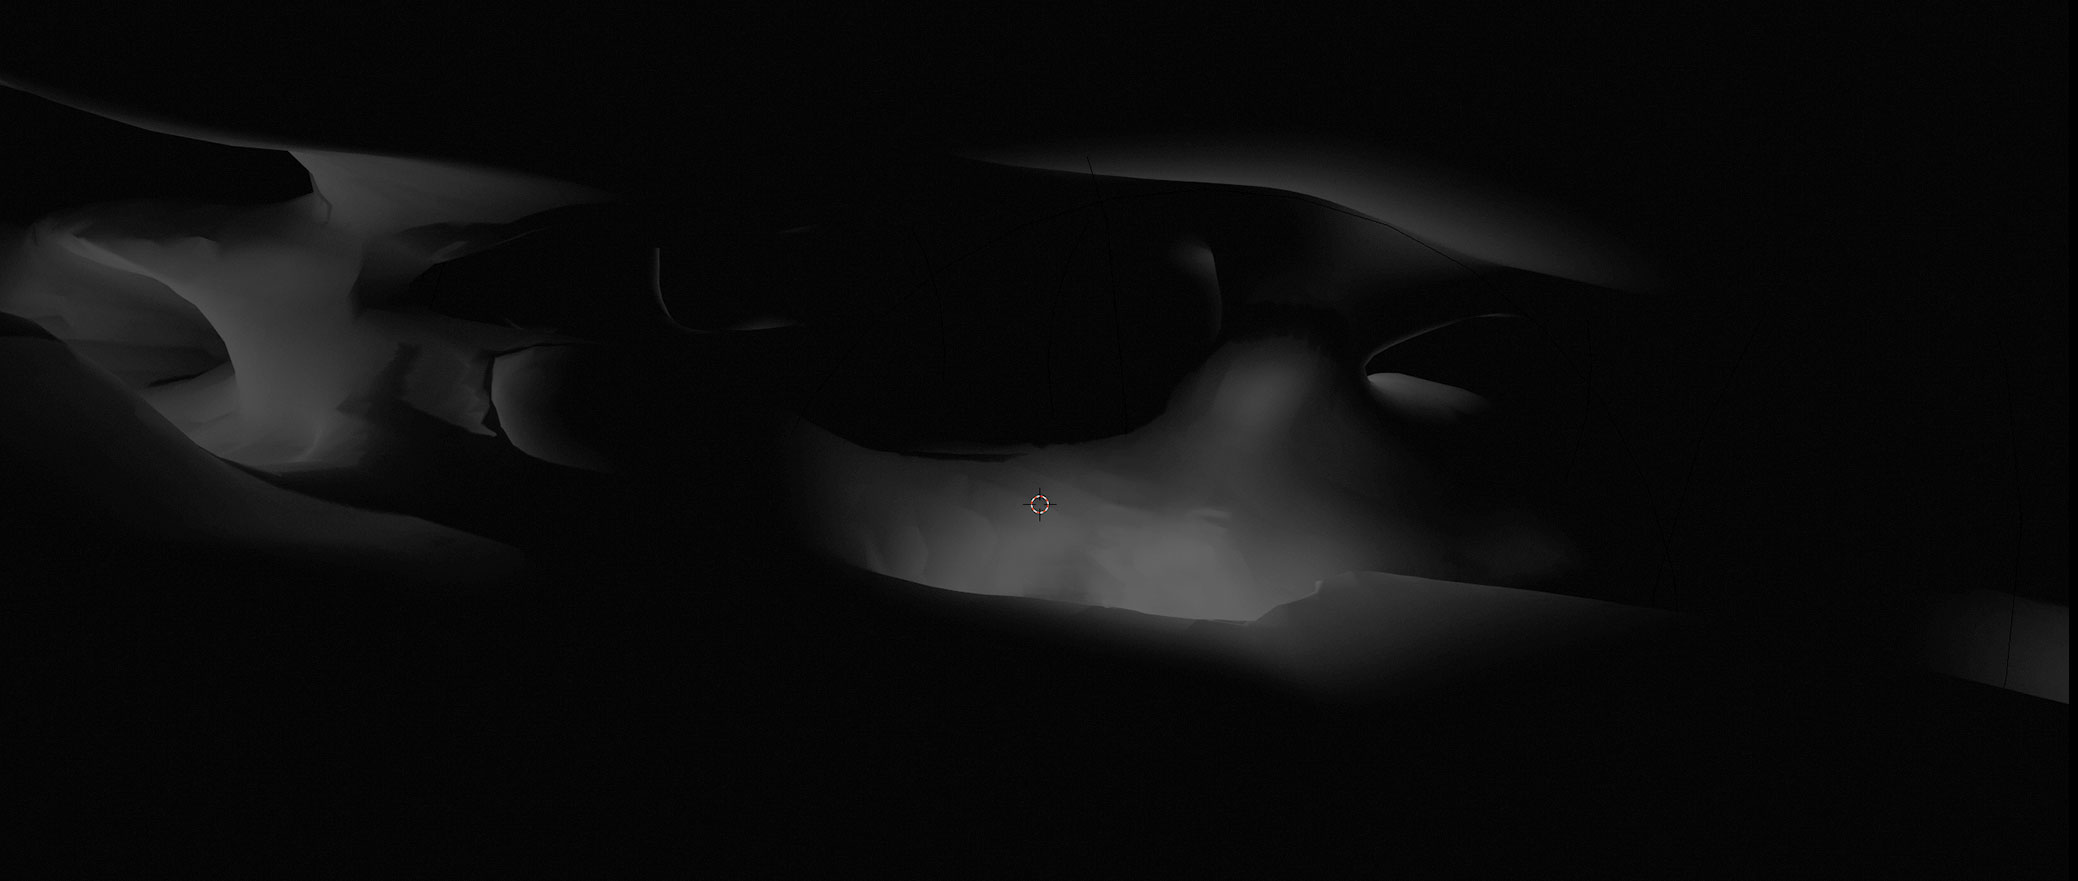 Wraiths_2019Animatic_Thumbsheet-02_71.jpg